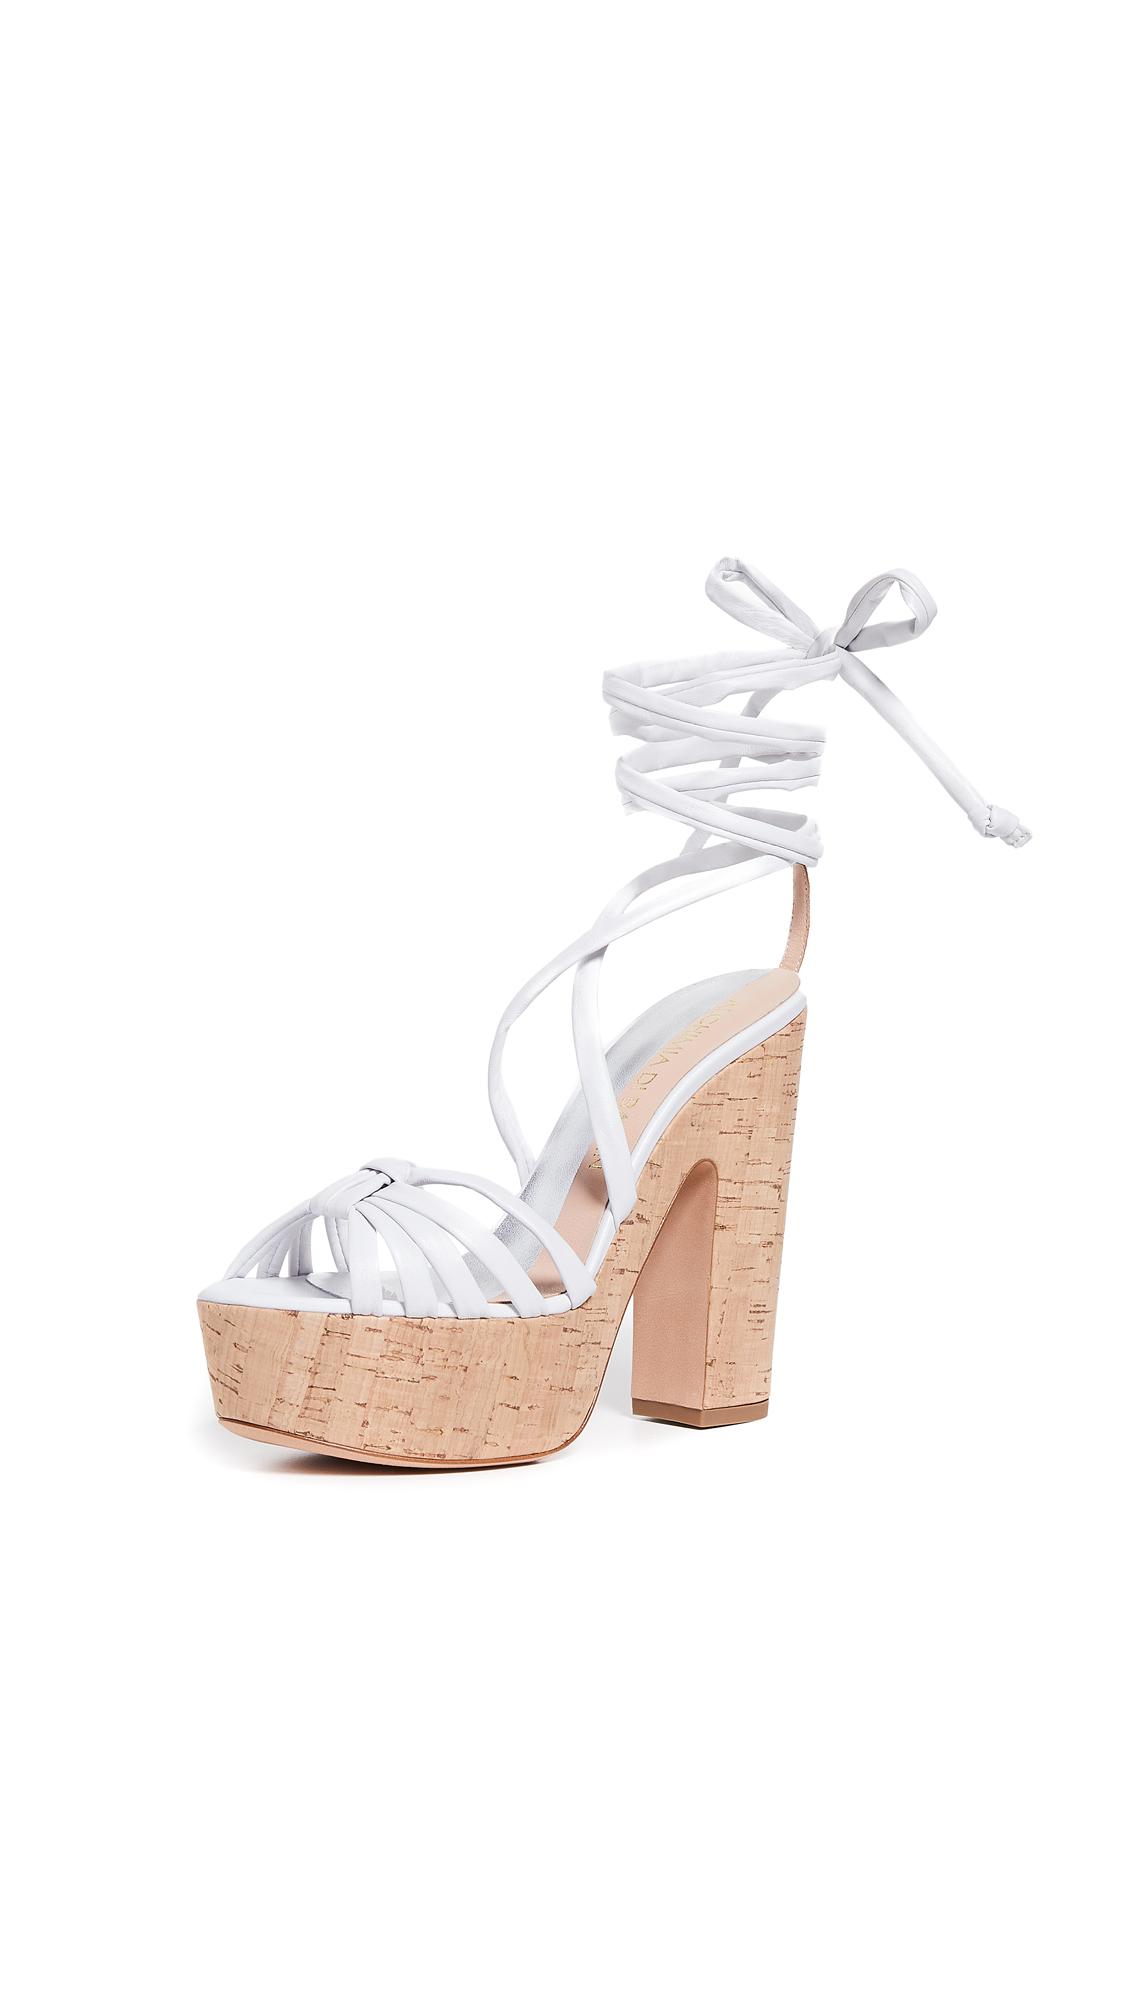 3b6eacfb0 Alchimia Di Ballin Bikini Platform Sandals In White | ModeSens